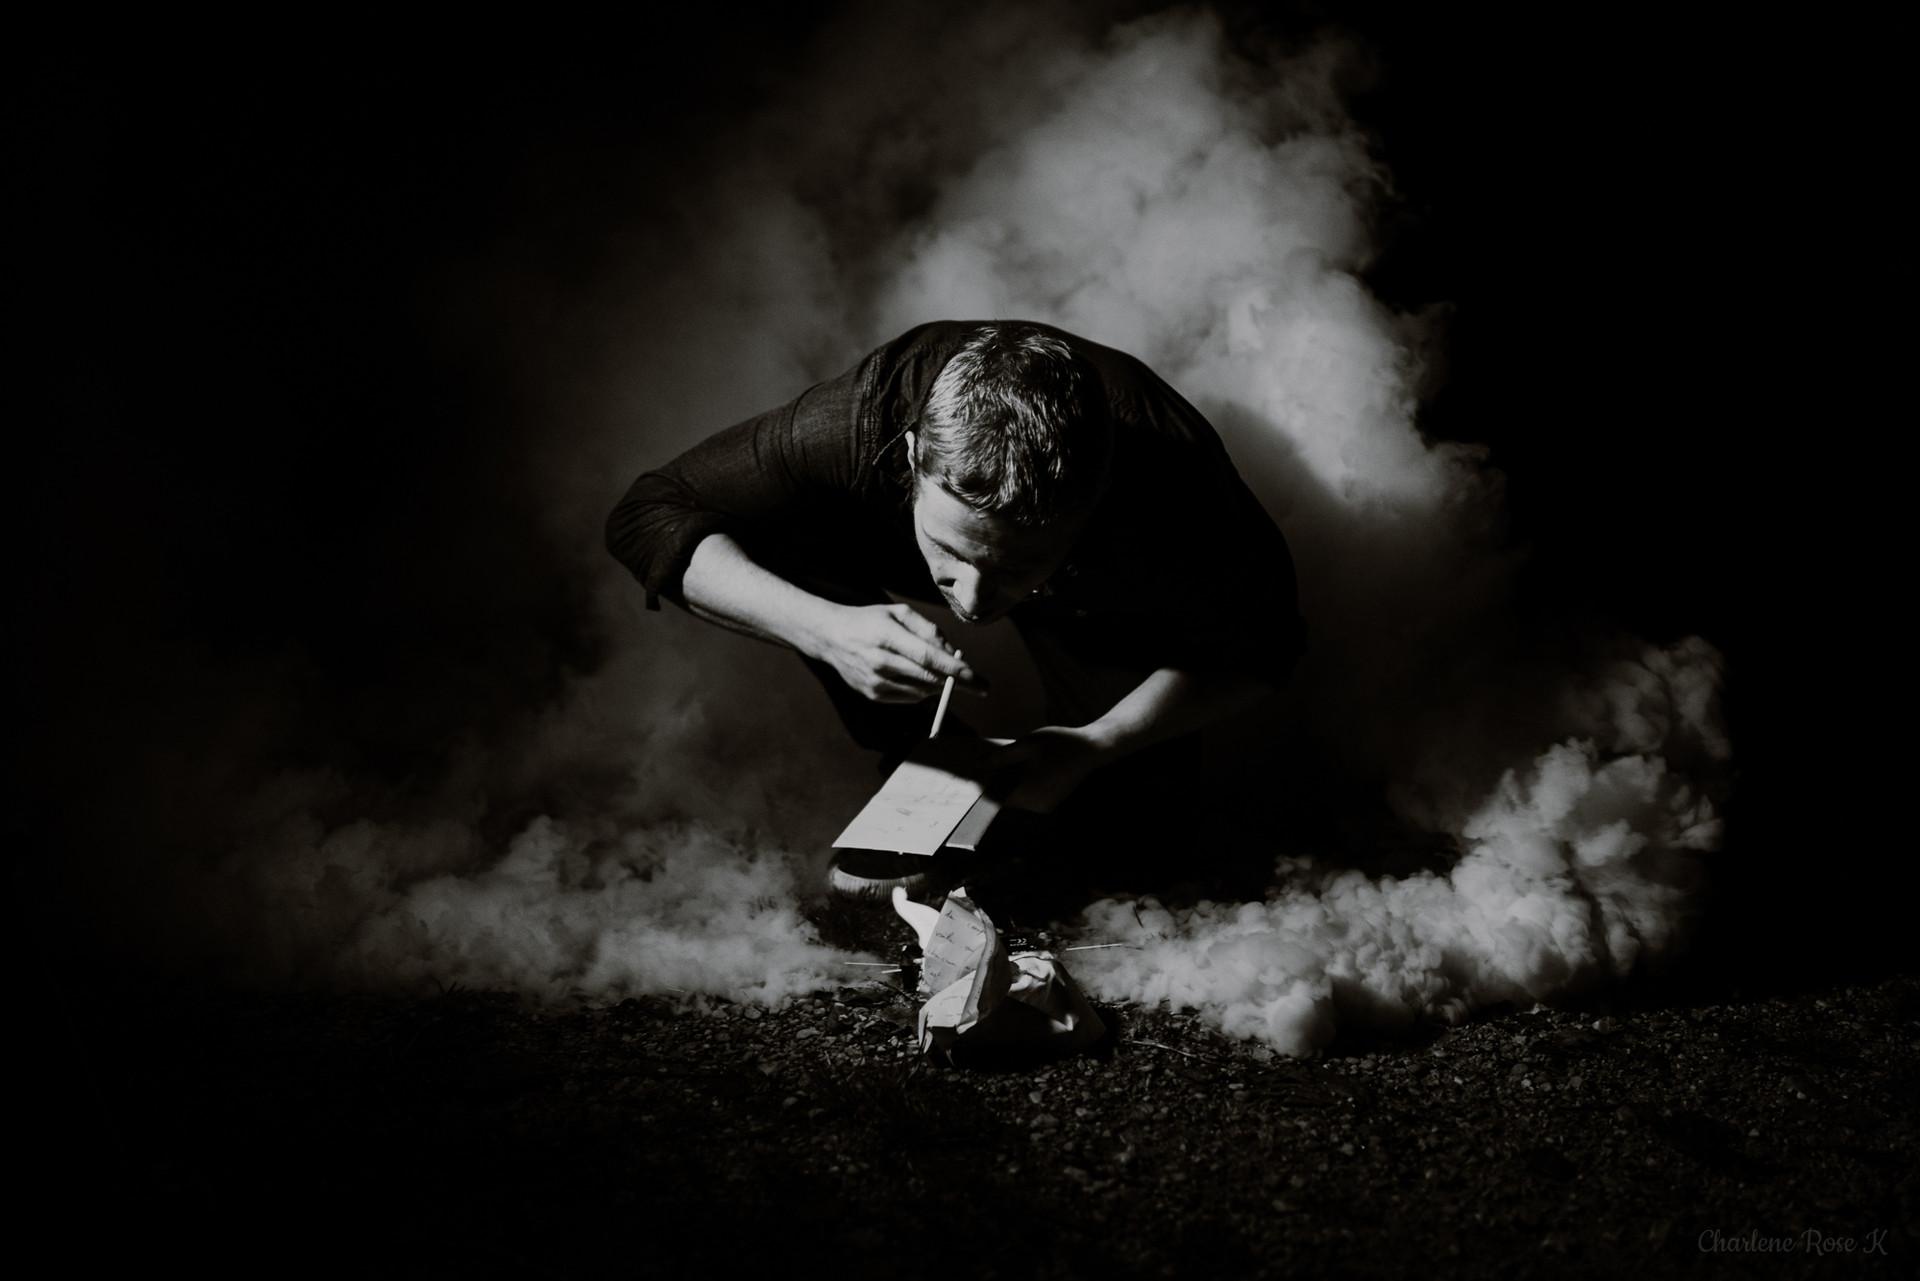 seance,photo,troyes,homme,noir,blanc,fumée,charlene,rose,k